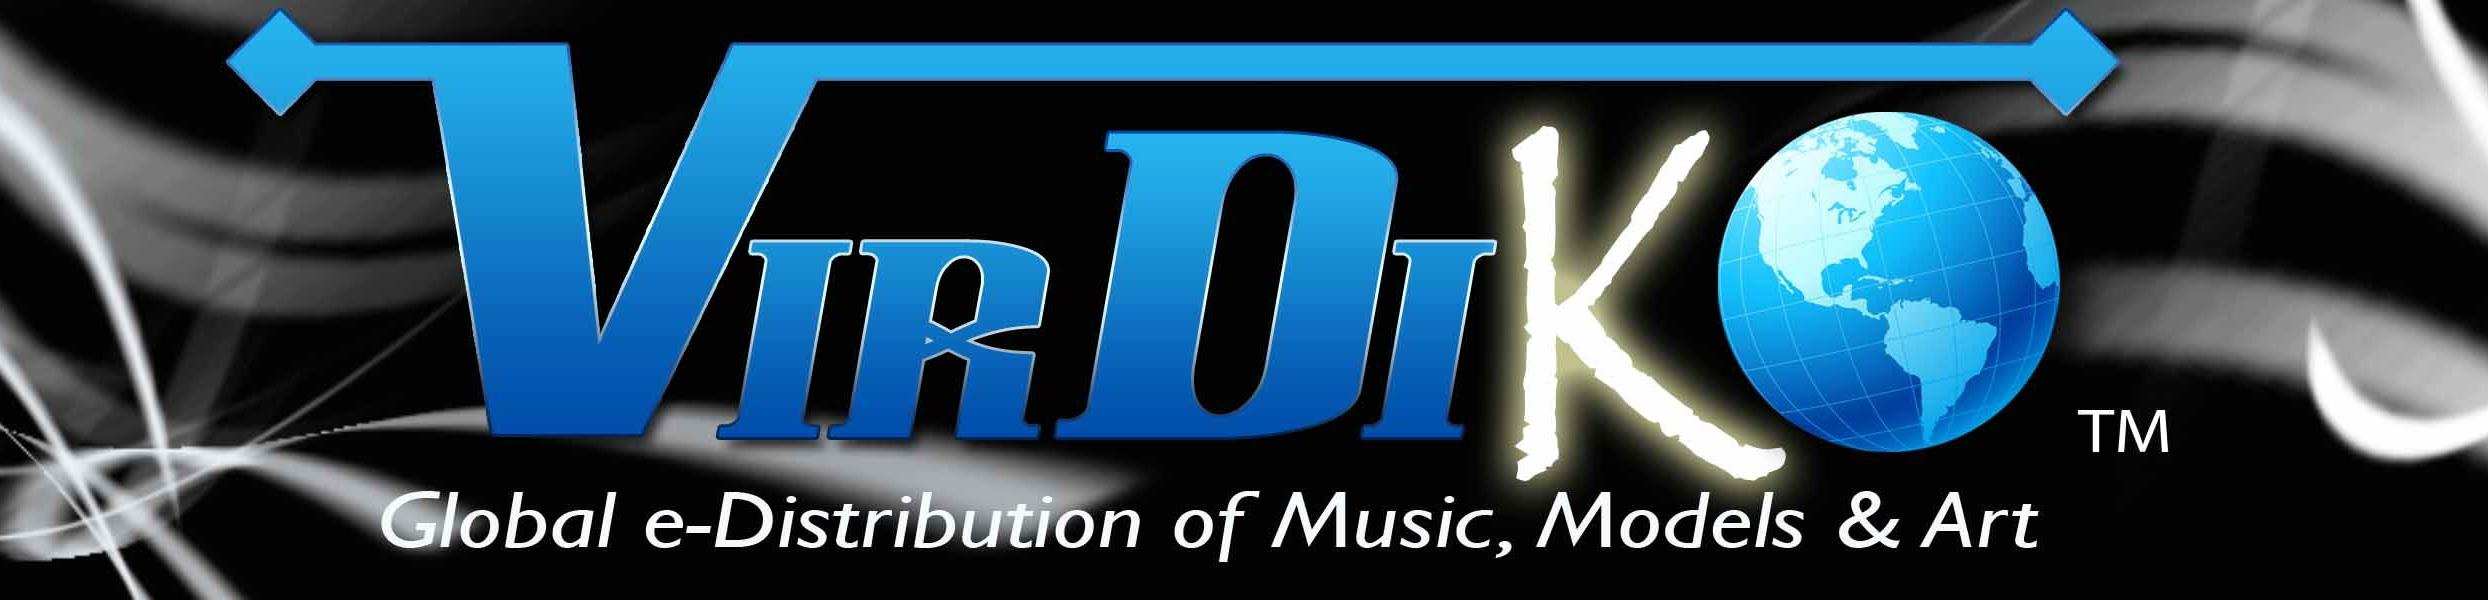 ReeWine presents Vir Diko Global Distribution